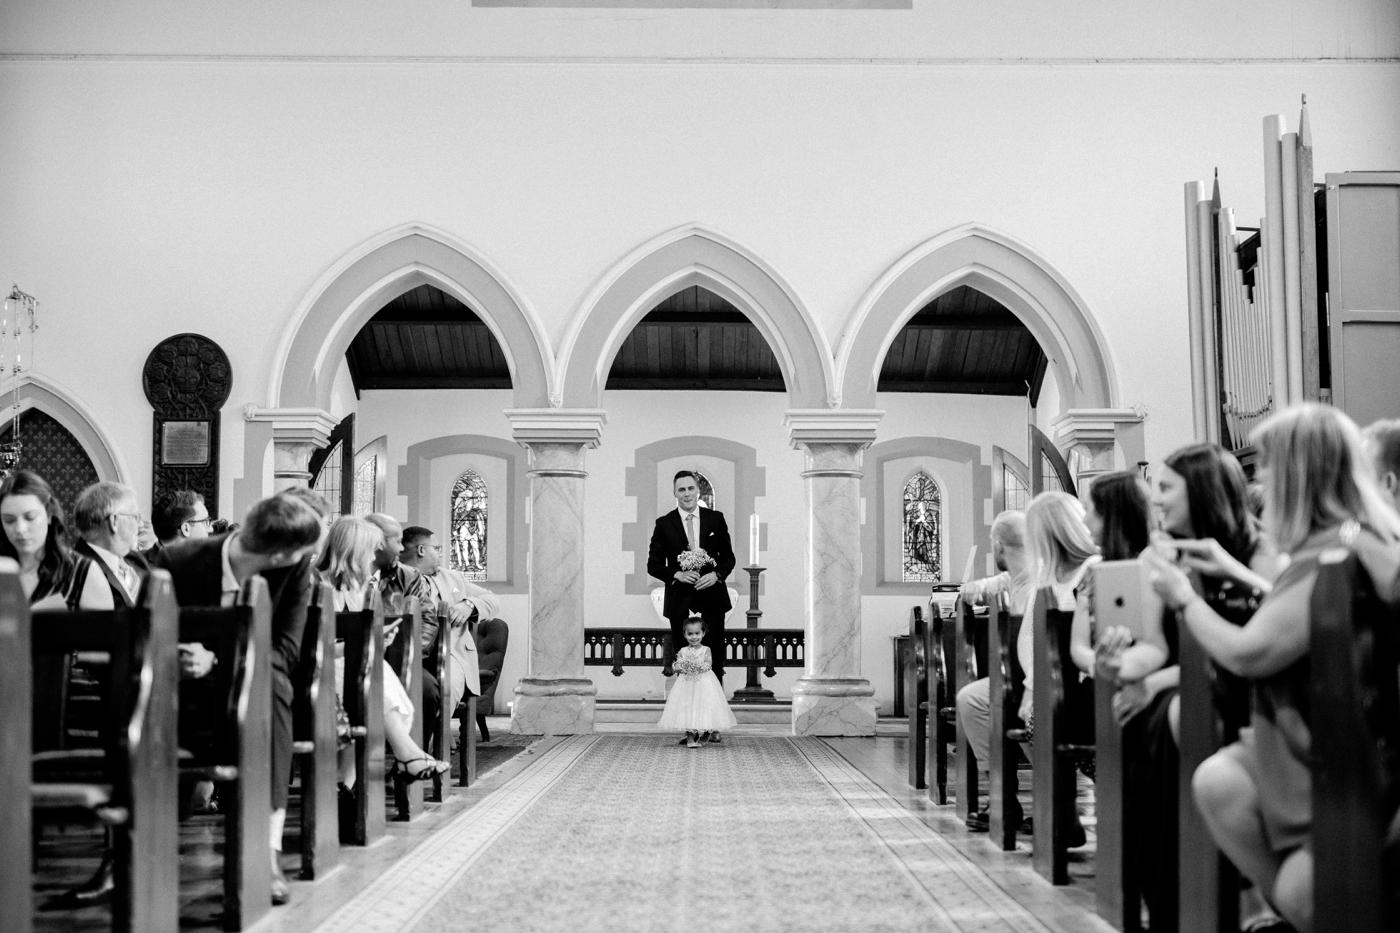 Erin & Ryan - Natural Wedding Photographer in Adelaide - Maximillians Wedding - Simple and Modern Wedding Photographer - Katherine Schultz - www.katherineschultzphotography.com_0011.jpg